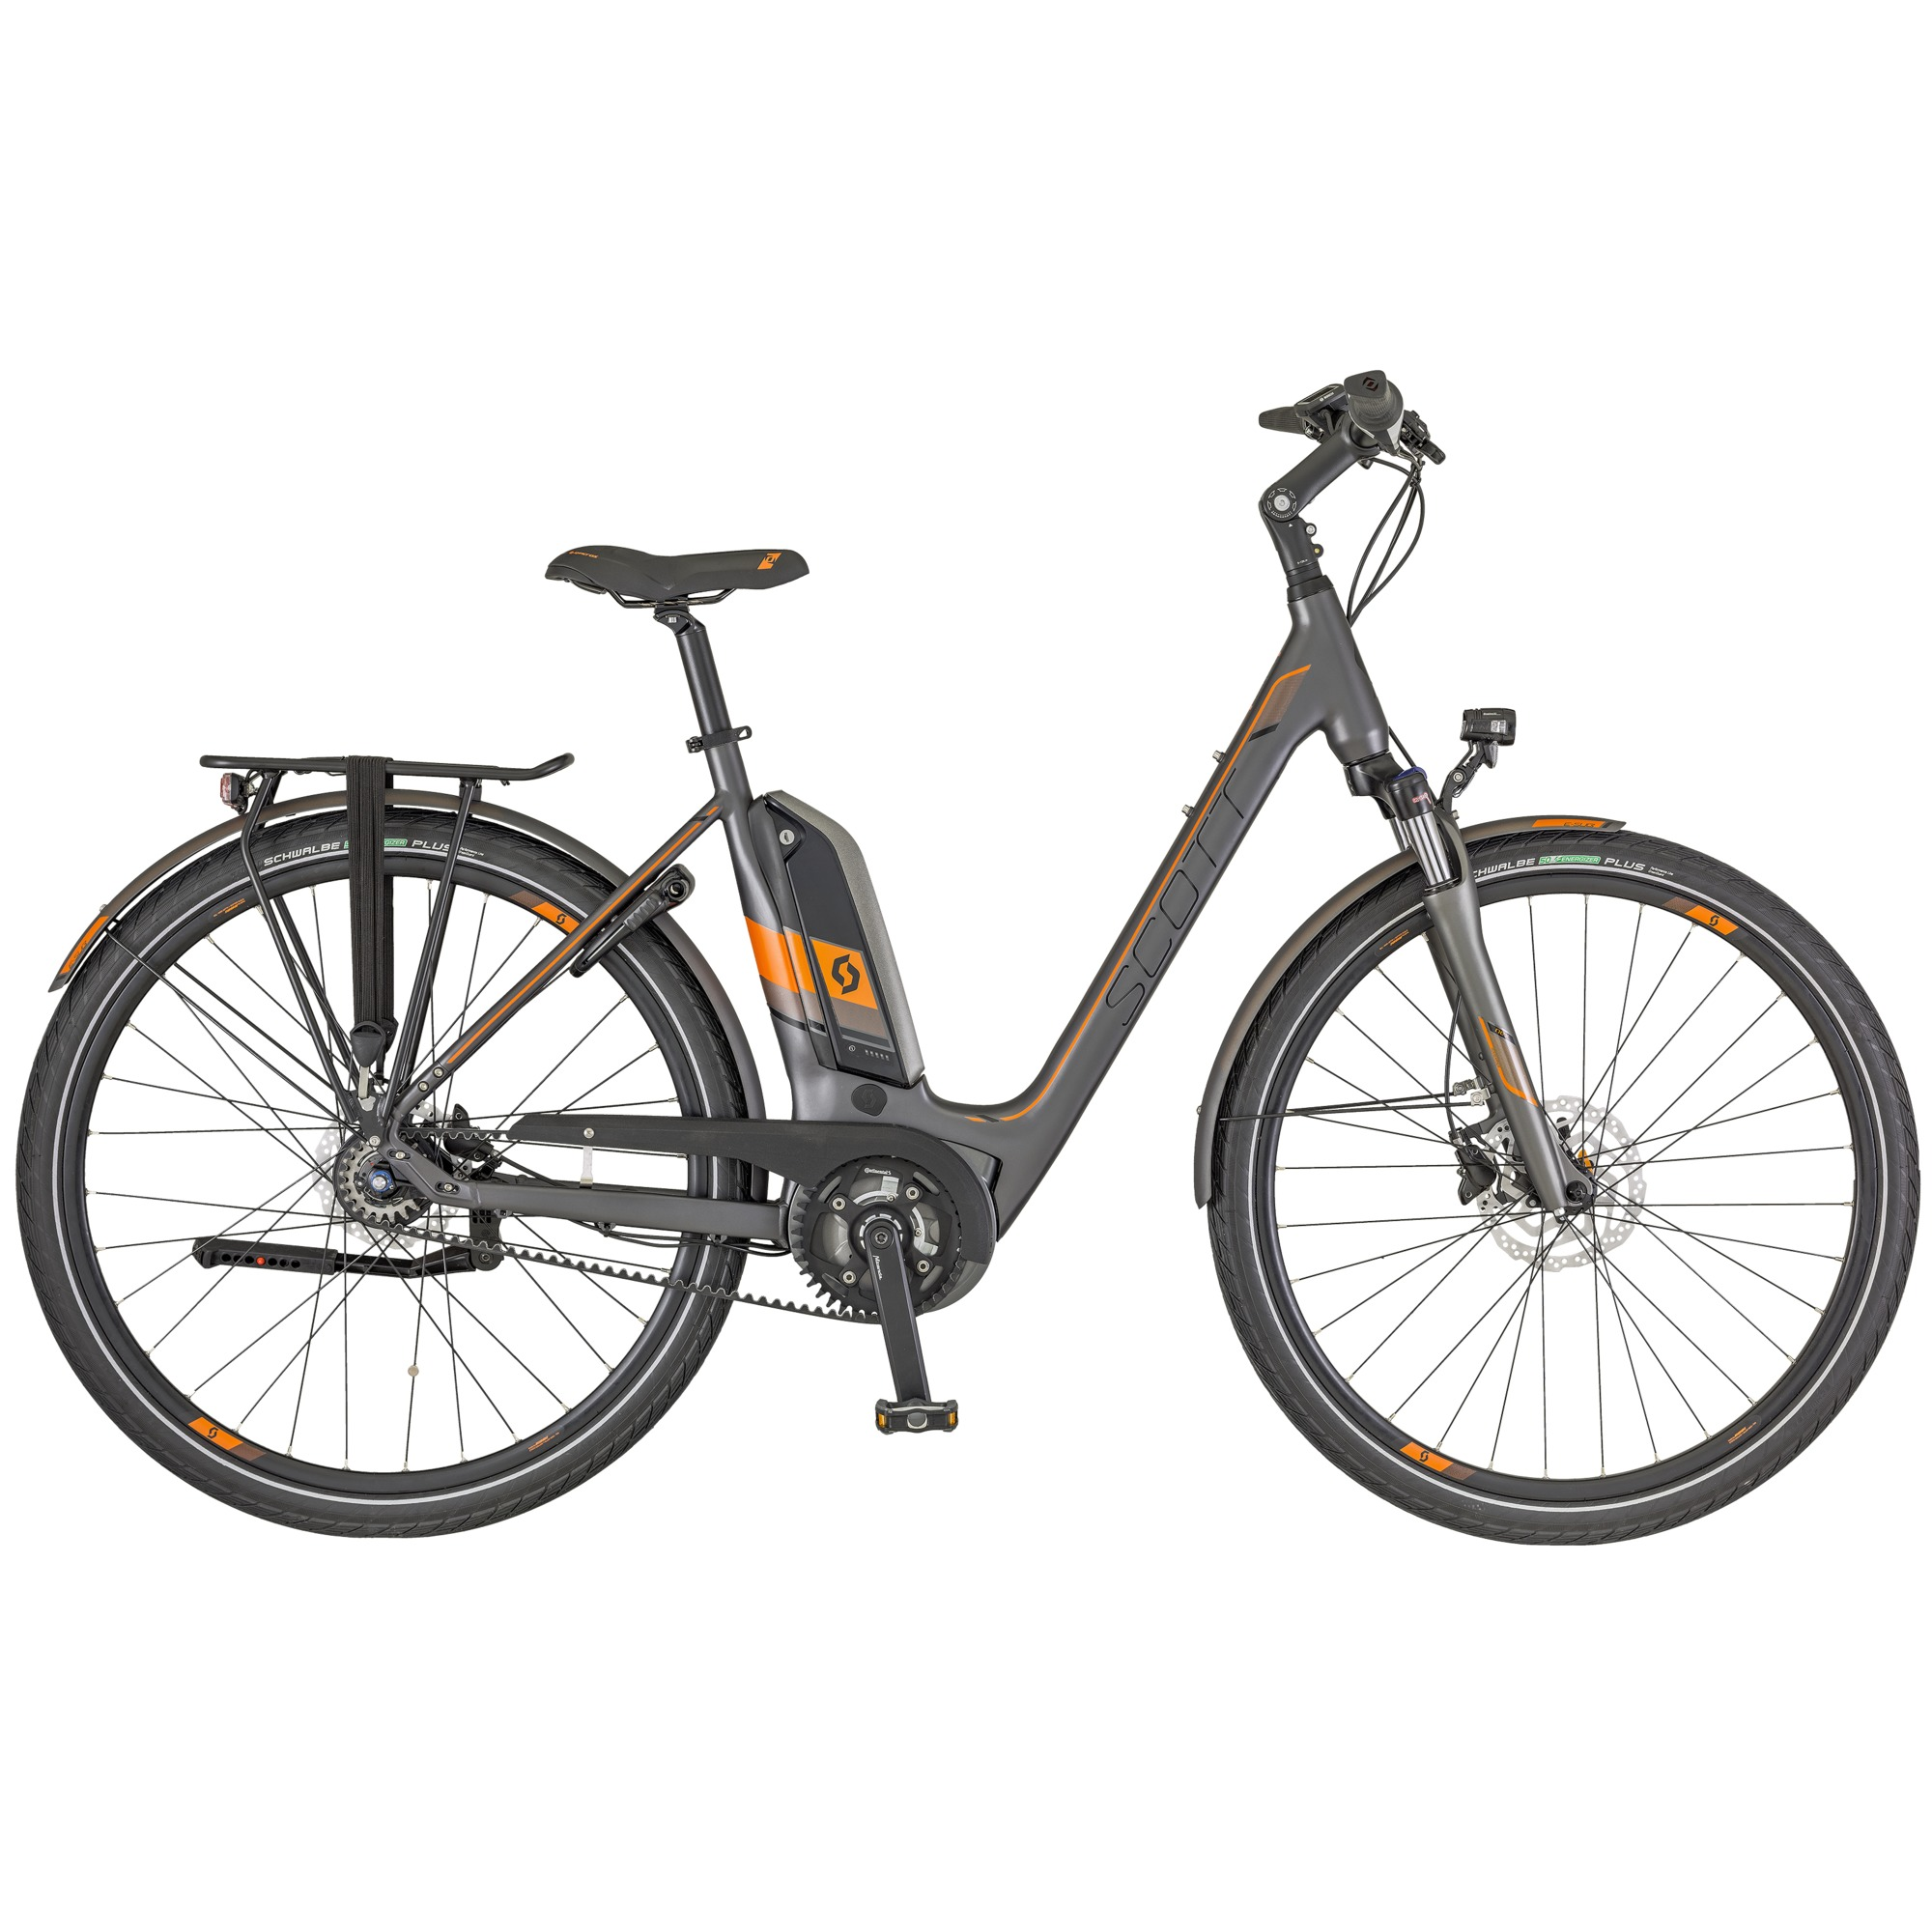 SCOTT E-Sub Tour Unisex-Bike (Riemenantrieb) L - Zweirad Homann